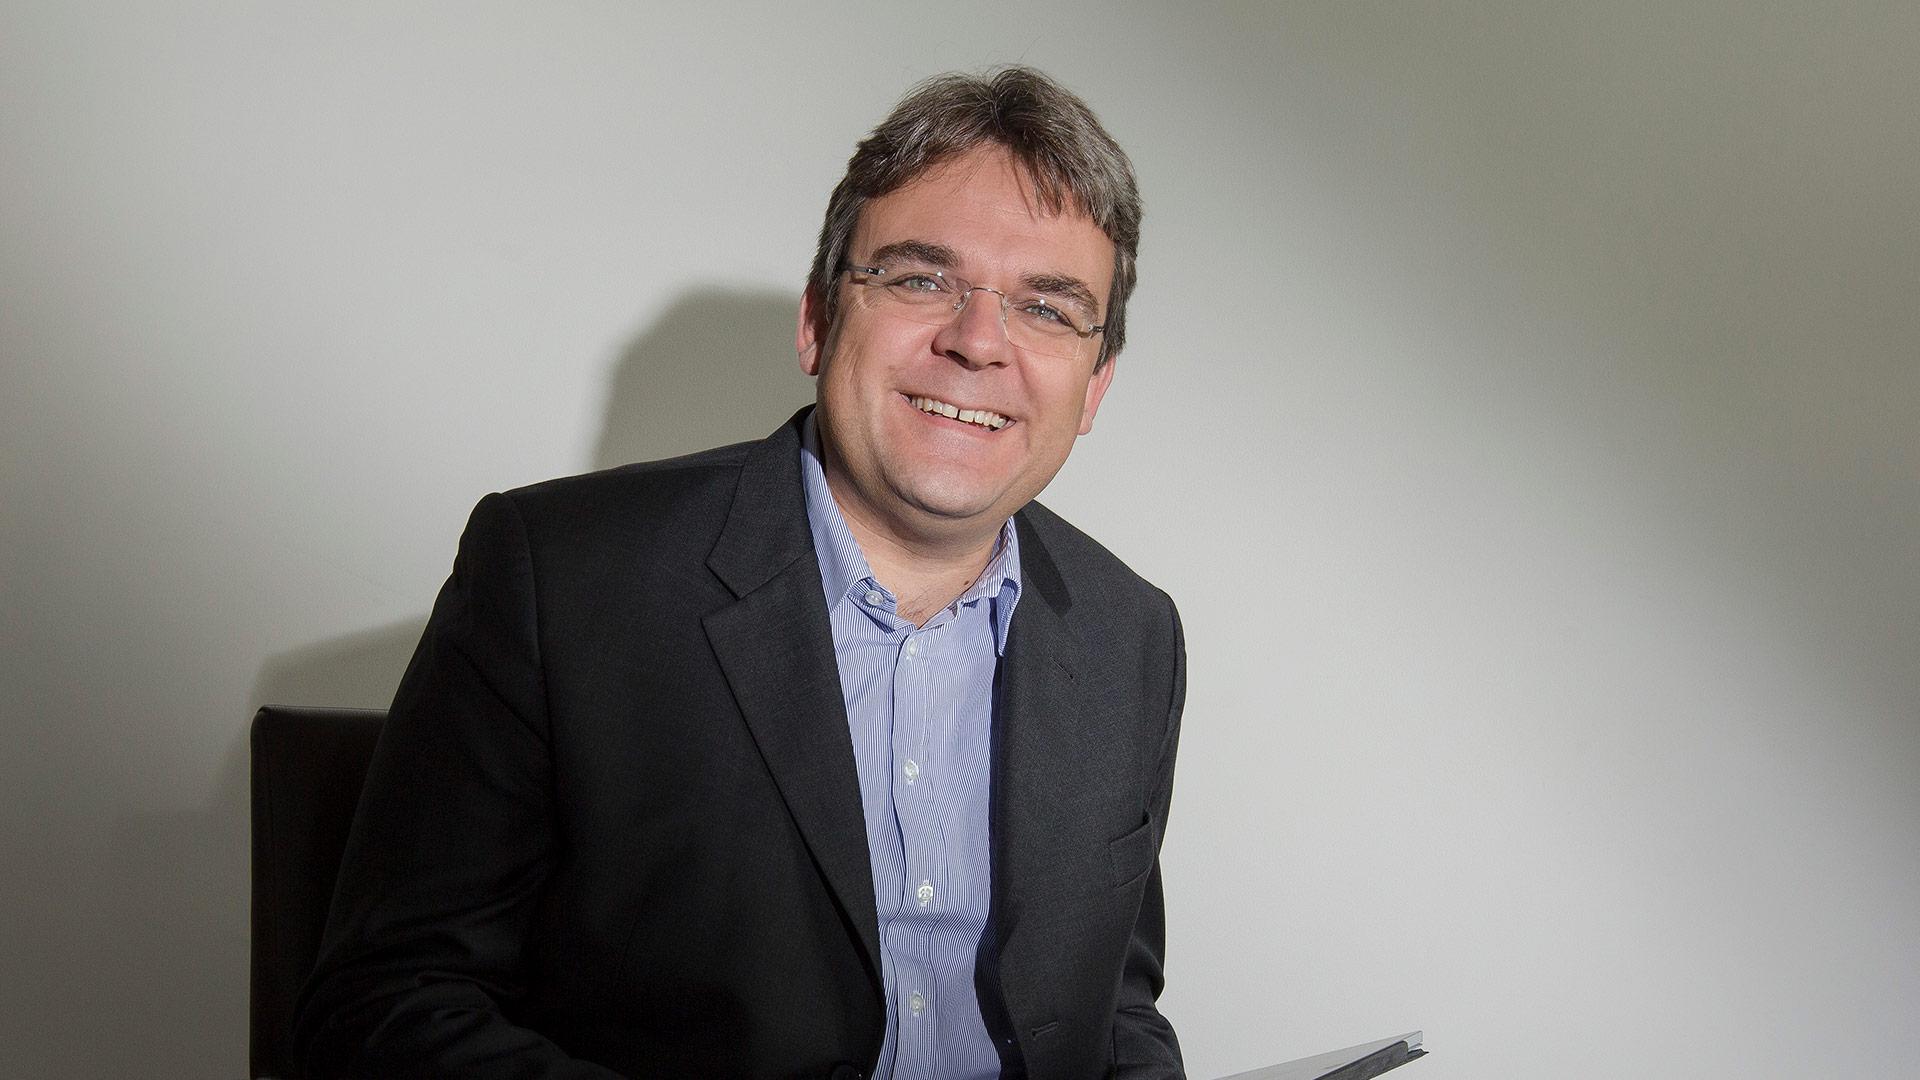 Matthias Orthwein